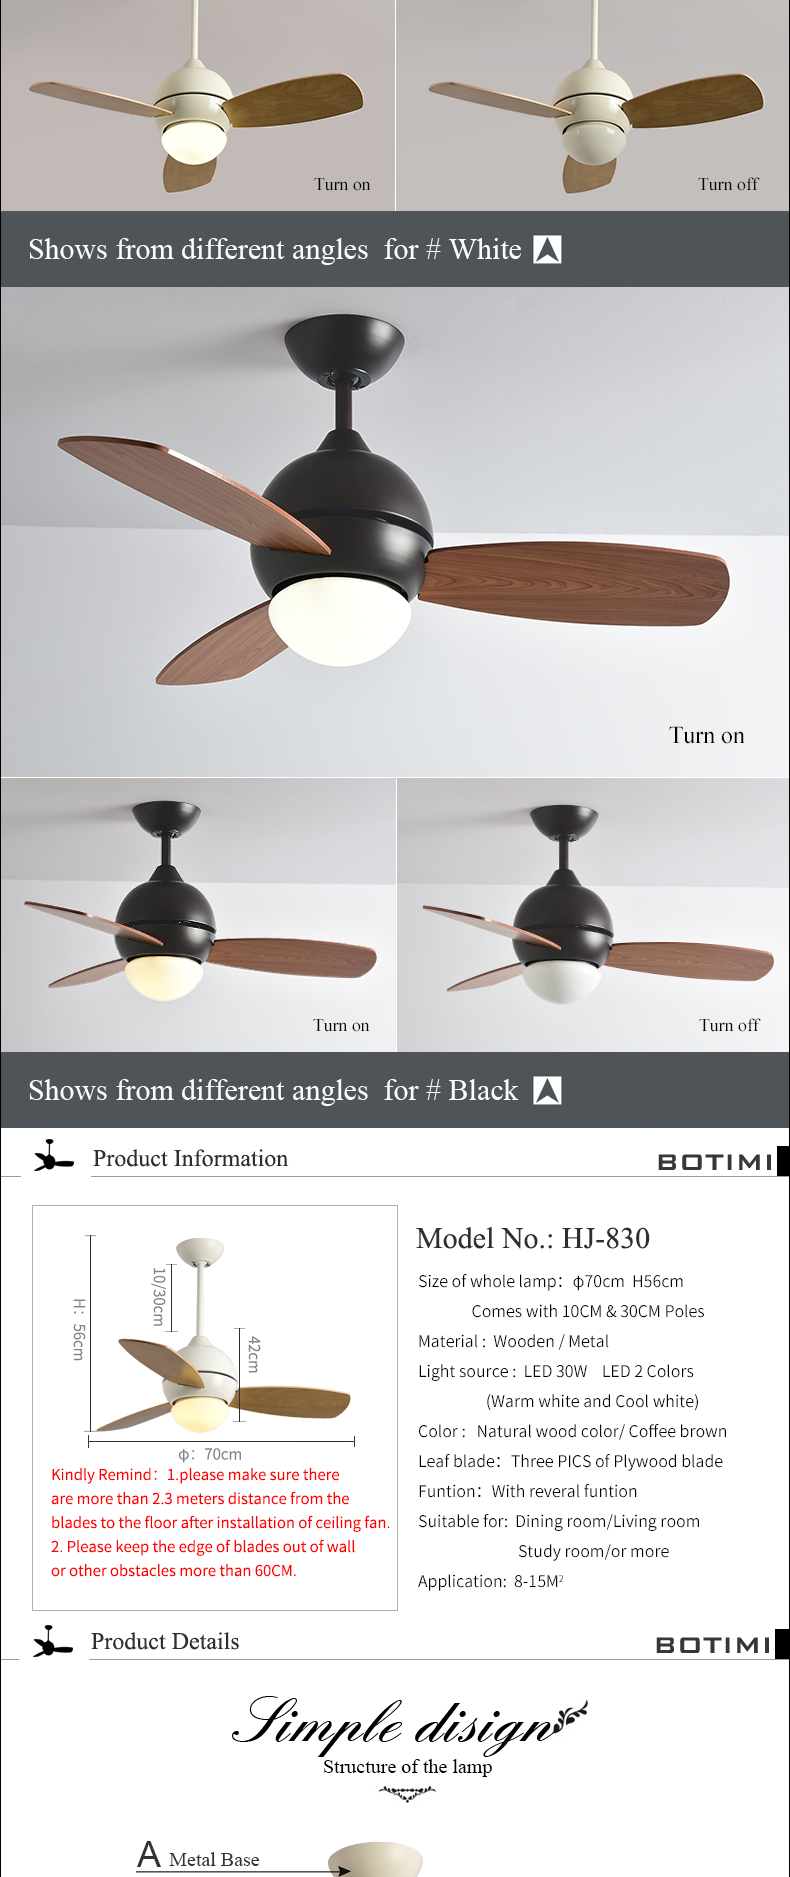 MD02376-_03